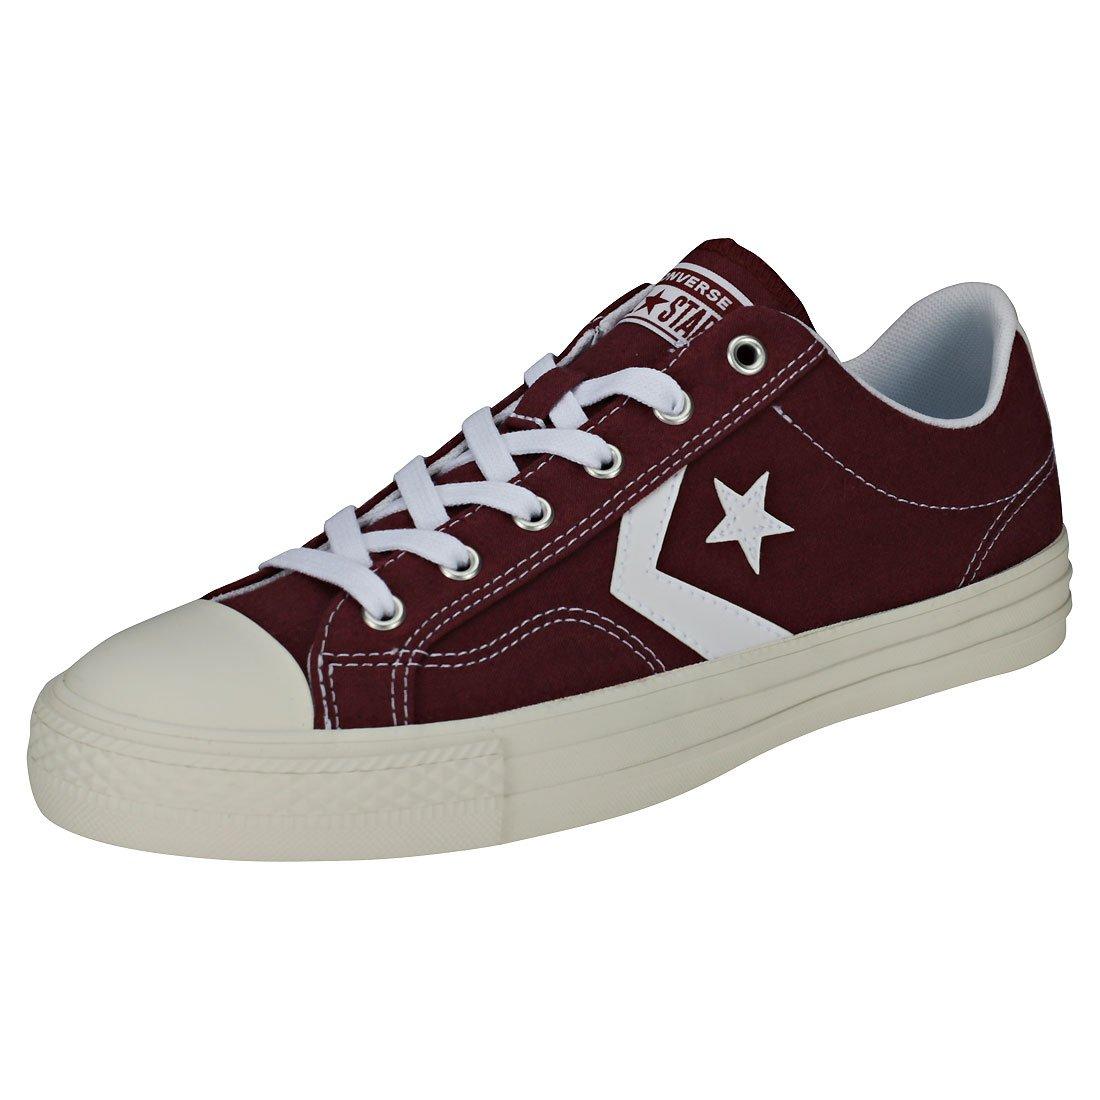 Converse Lifestyle Star Player Ox, Zapatillas Unisex Adulto 45 EU Multicolor (Dark Burgundy/White/White 613)